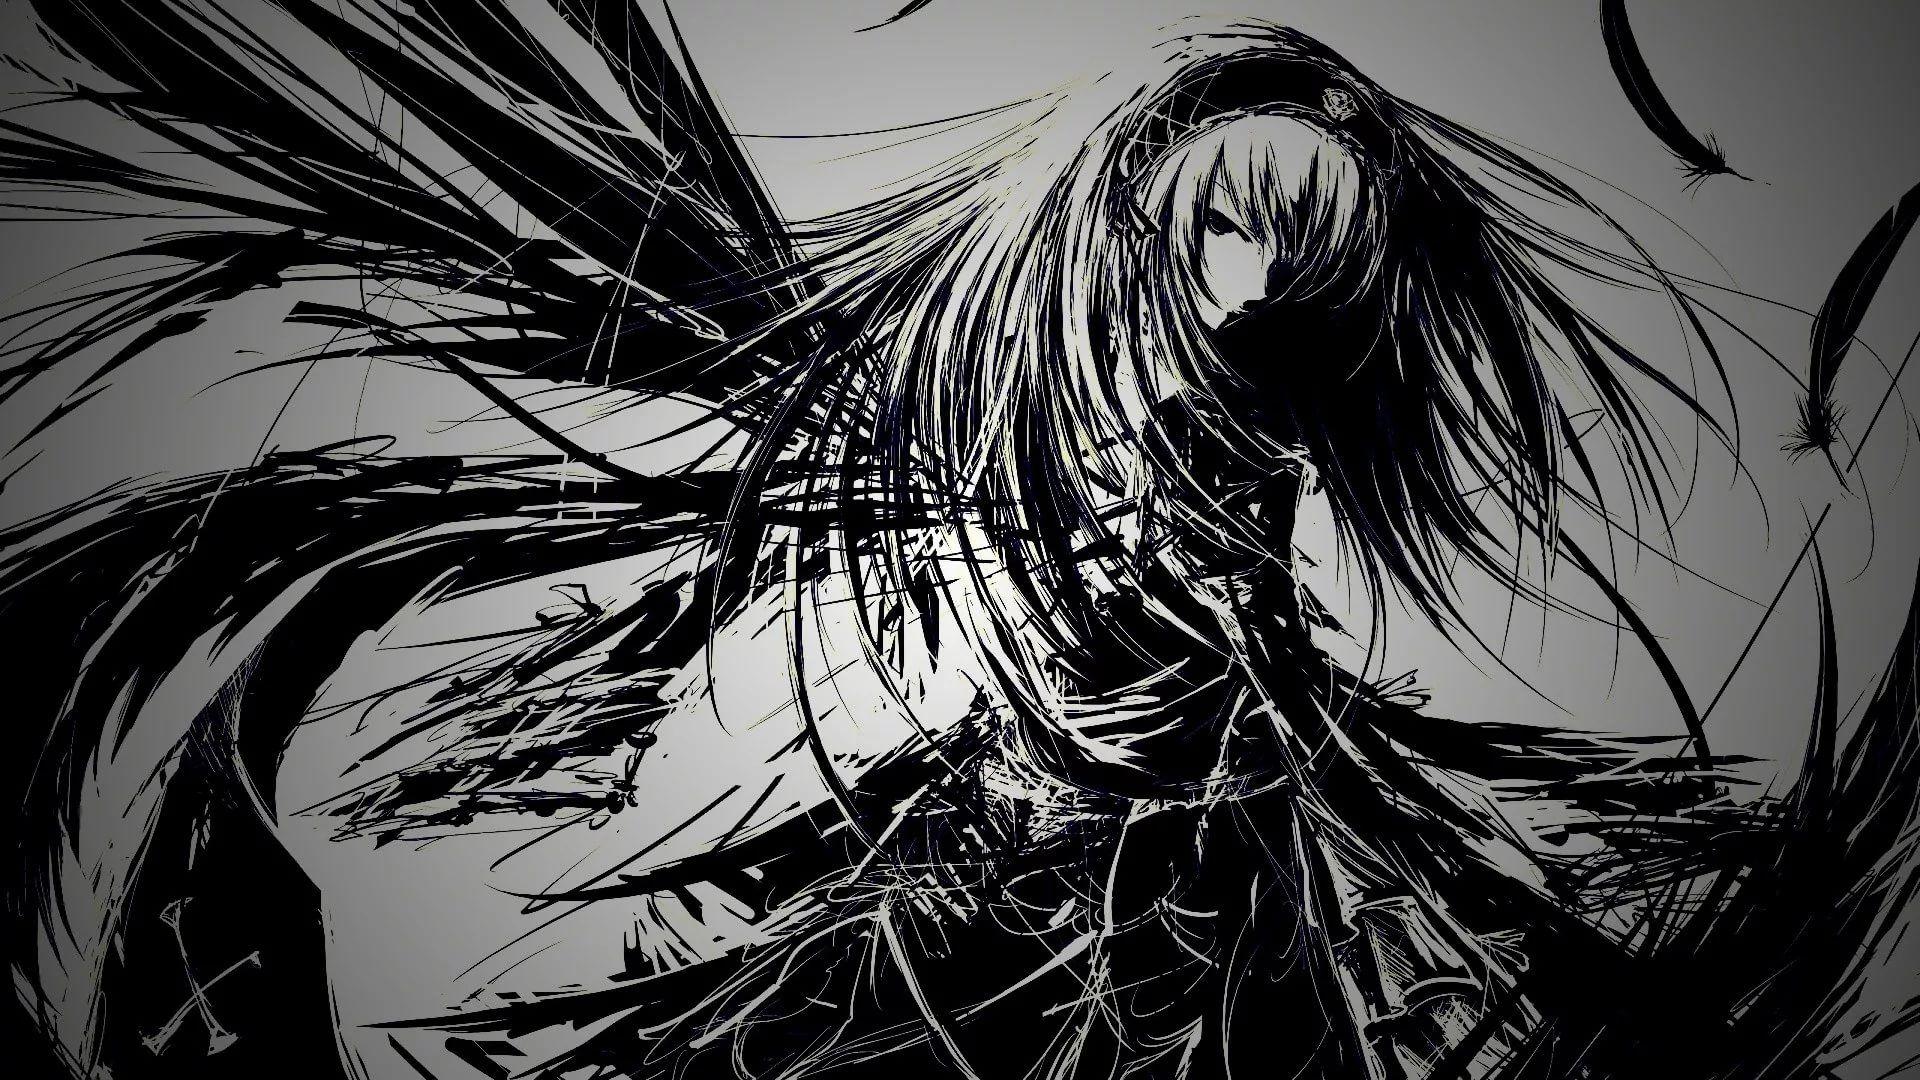 Dark Anime free download wallpaper